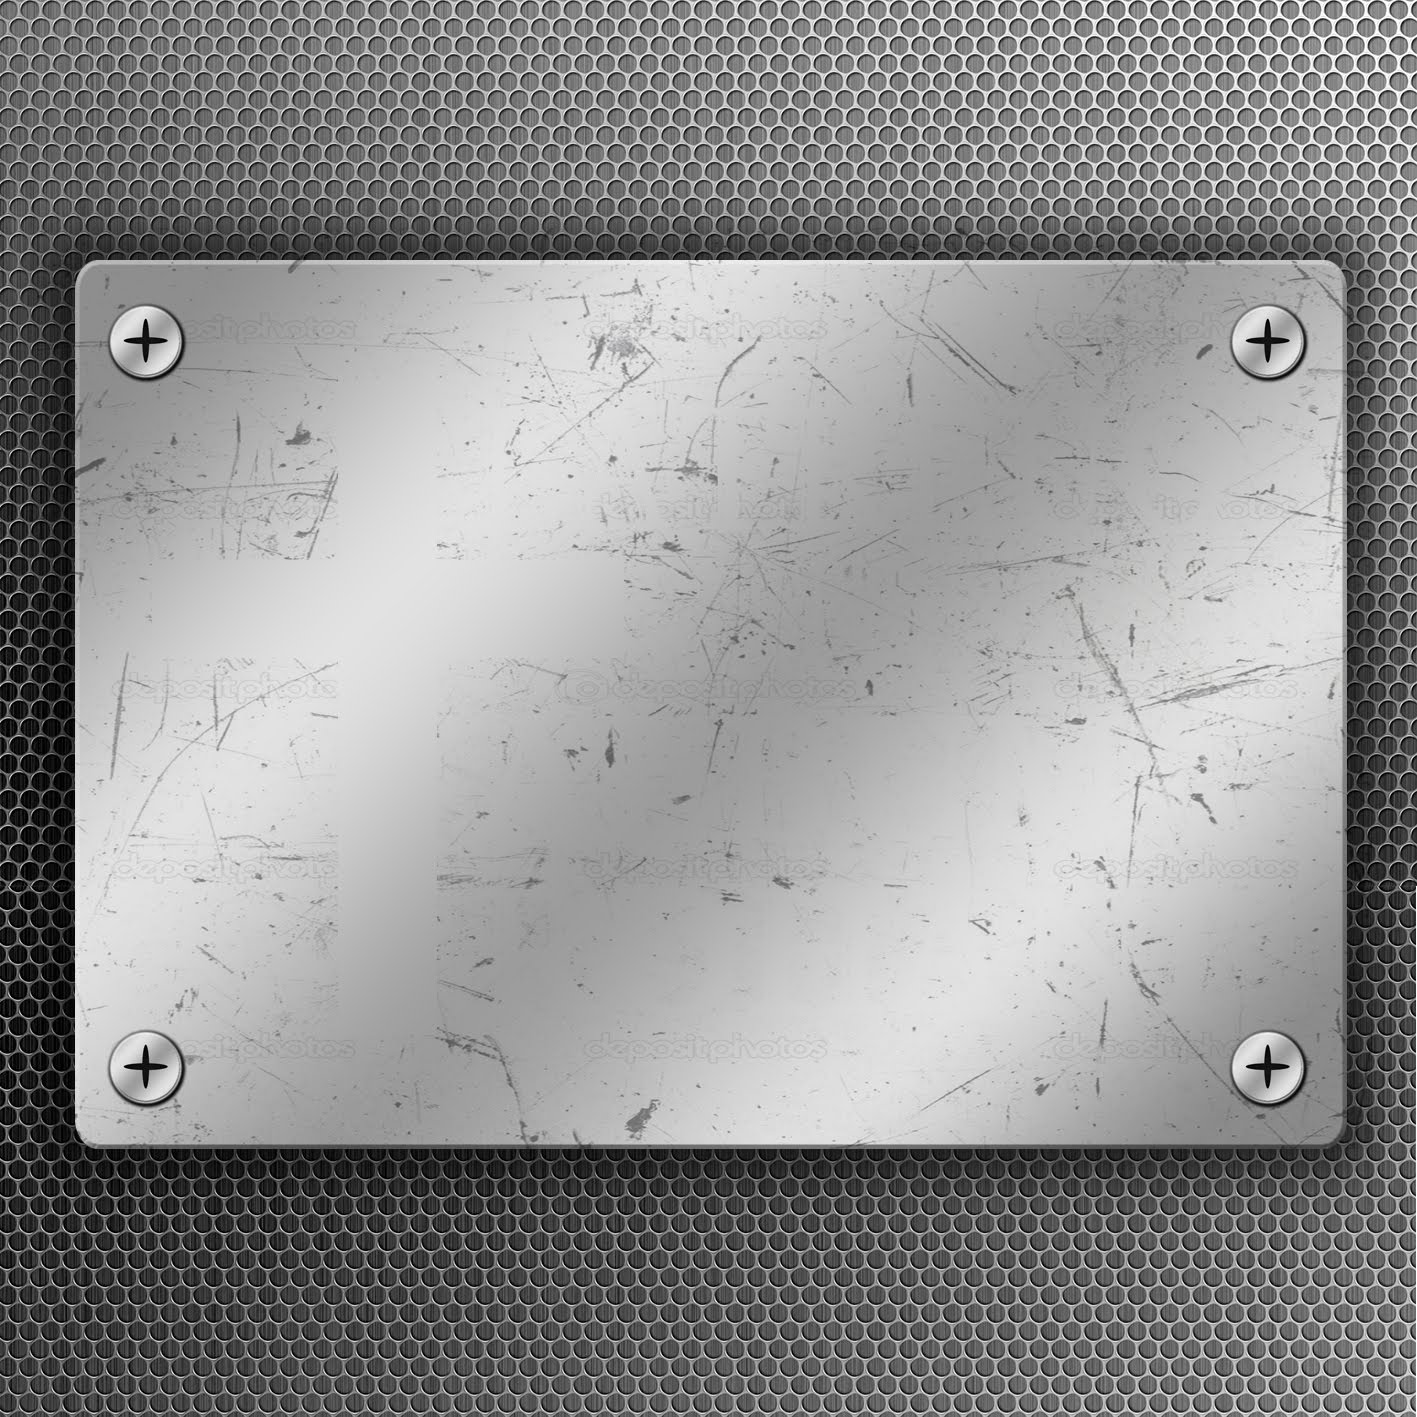 Tutorial Photoshop : Metal Plates - YouTube